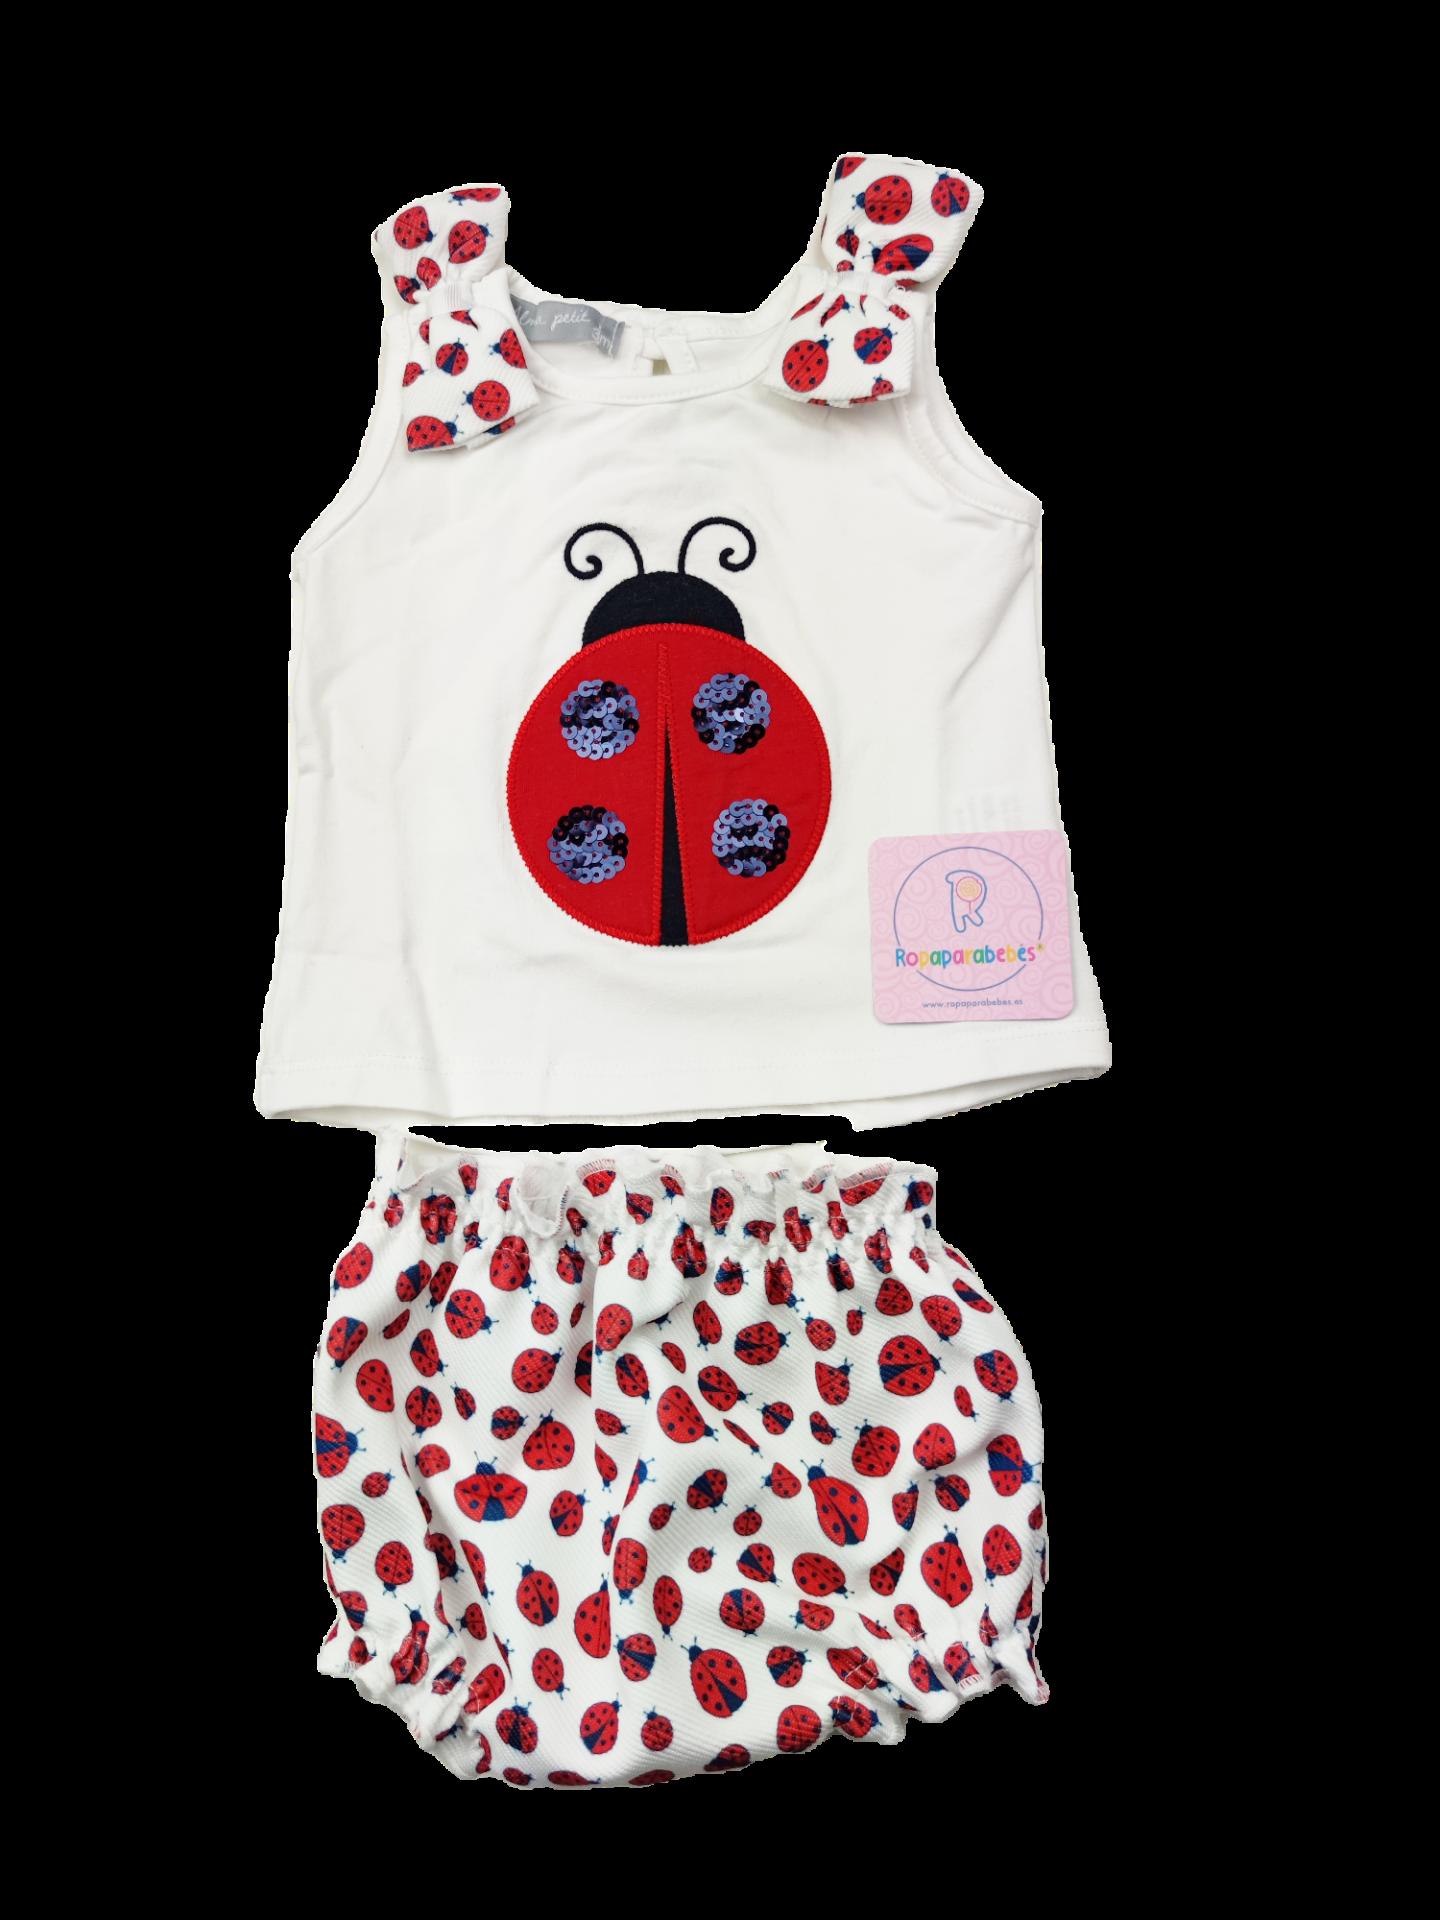 Conjunto niña 2 piezas Ladybug